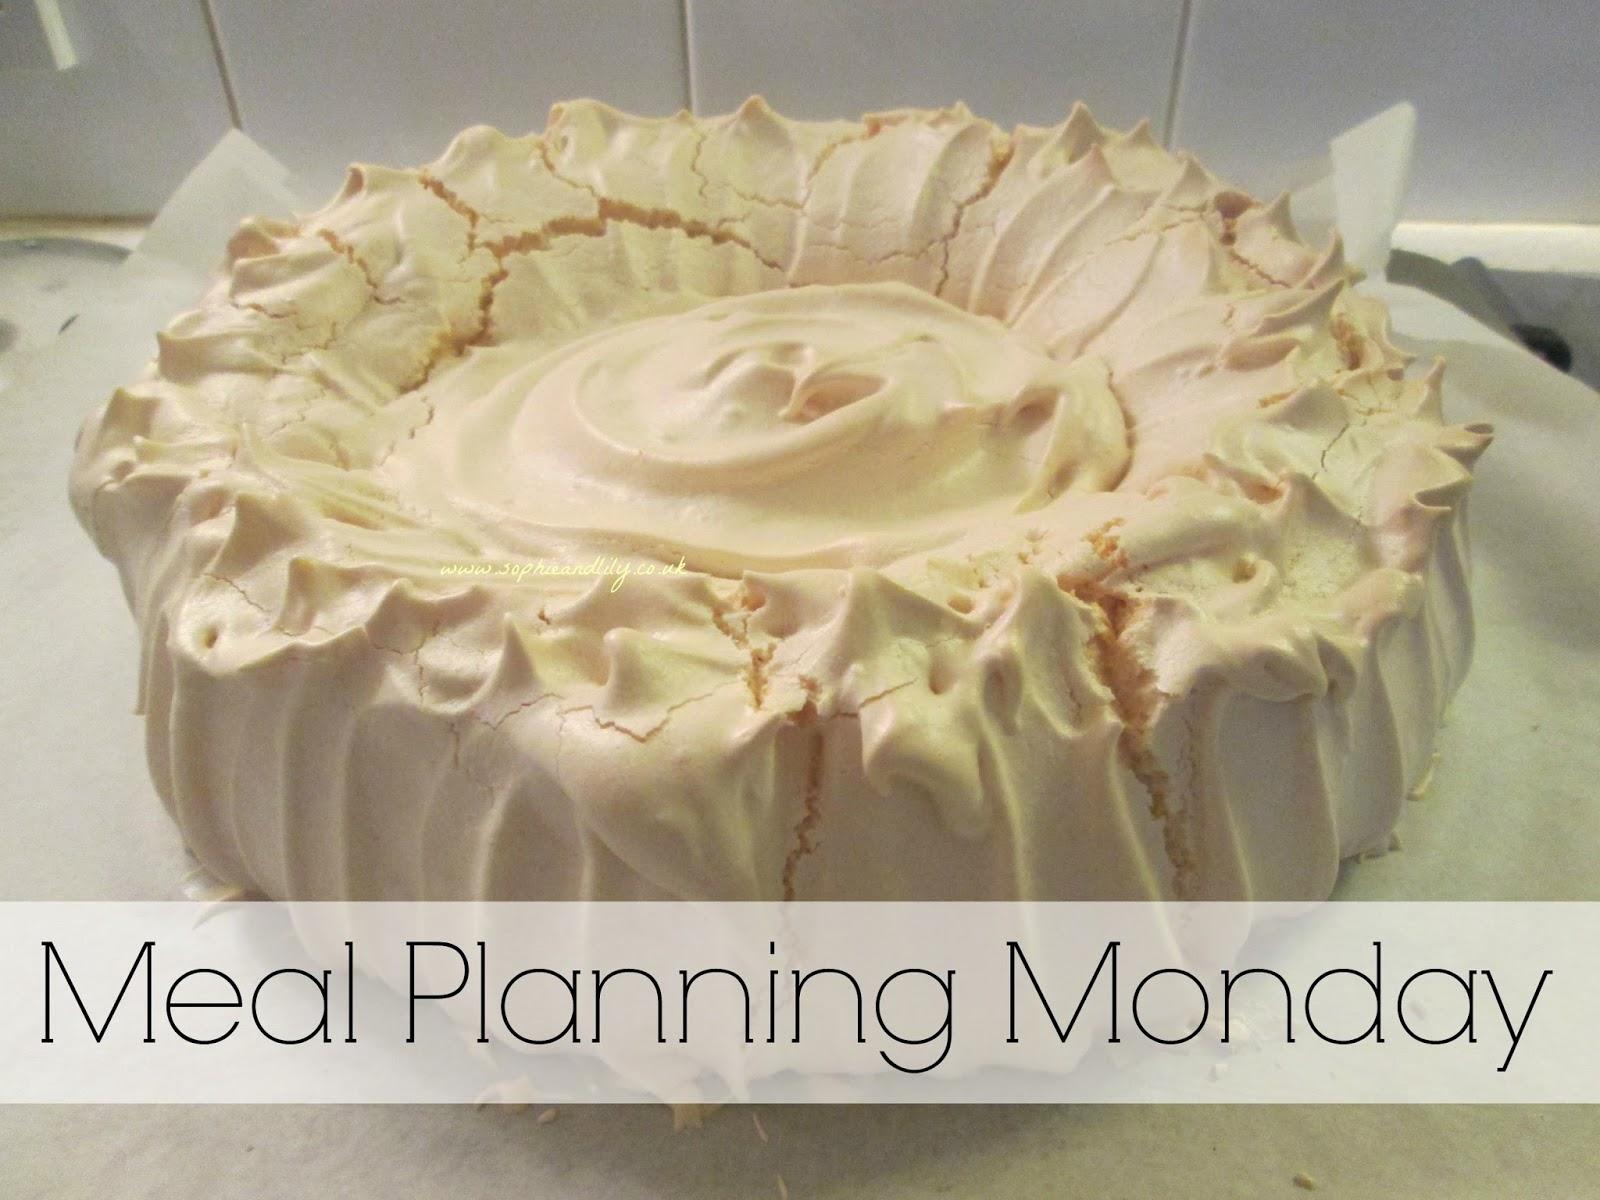 Meal Planning Monday - Pavlova